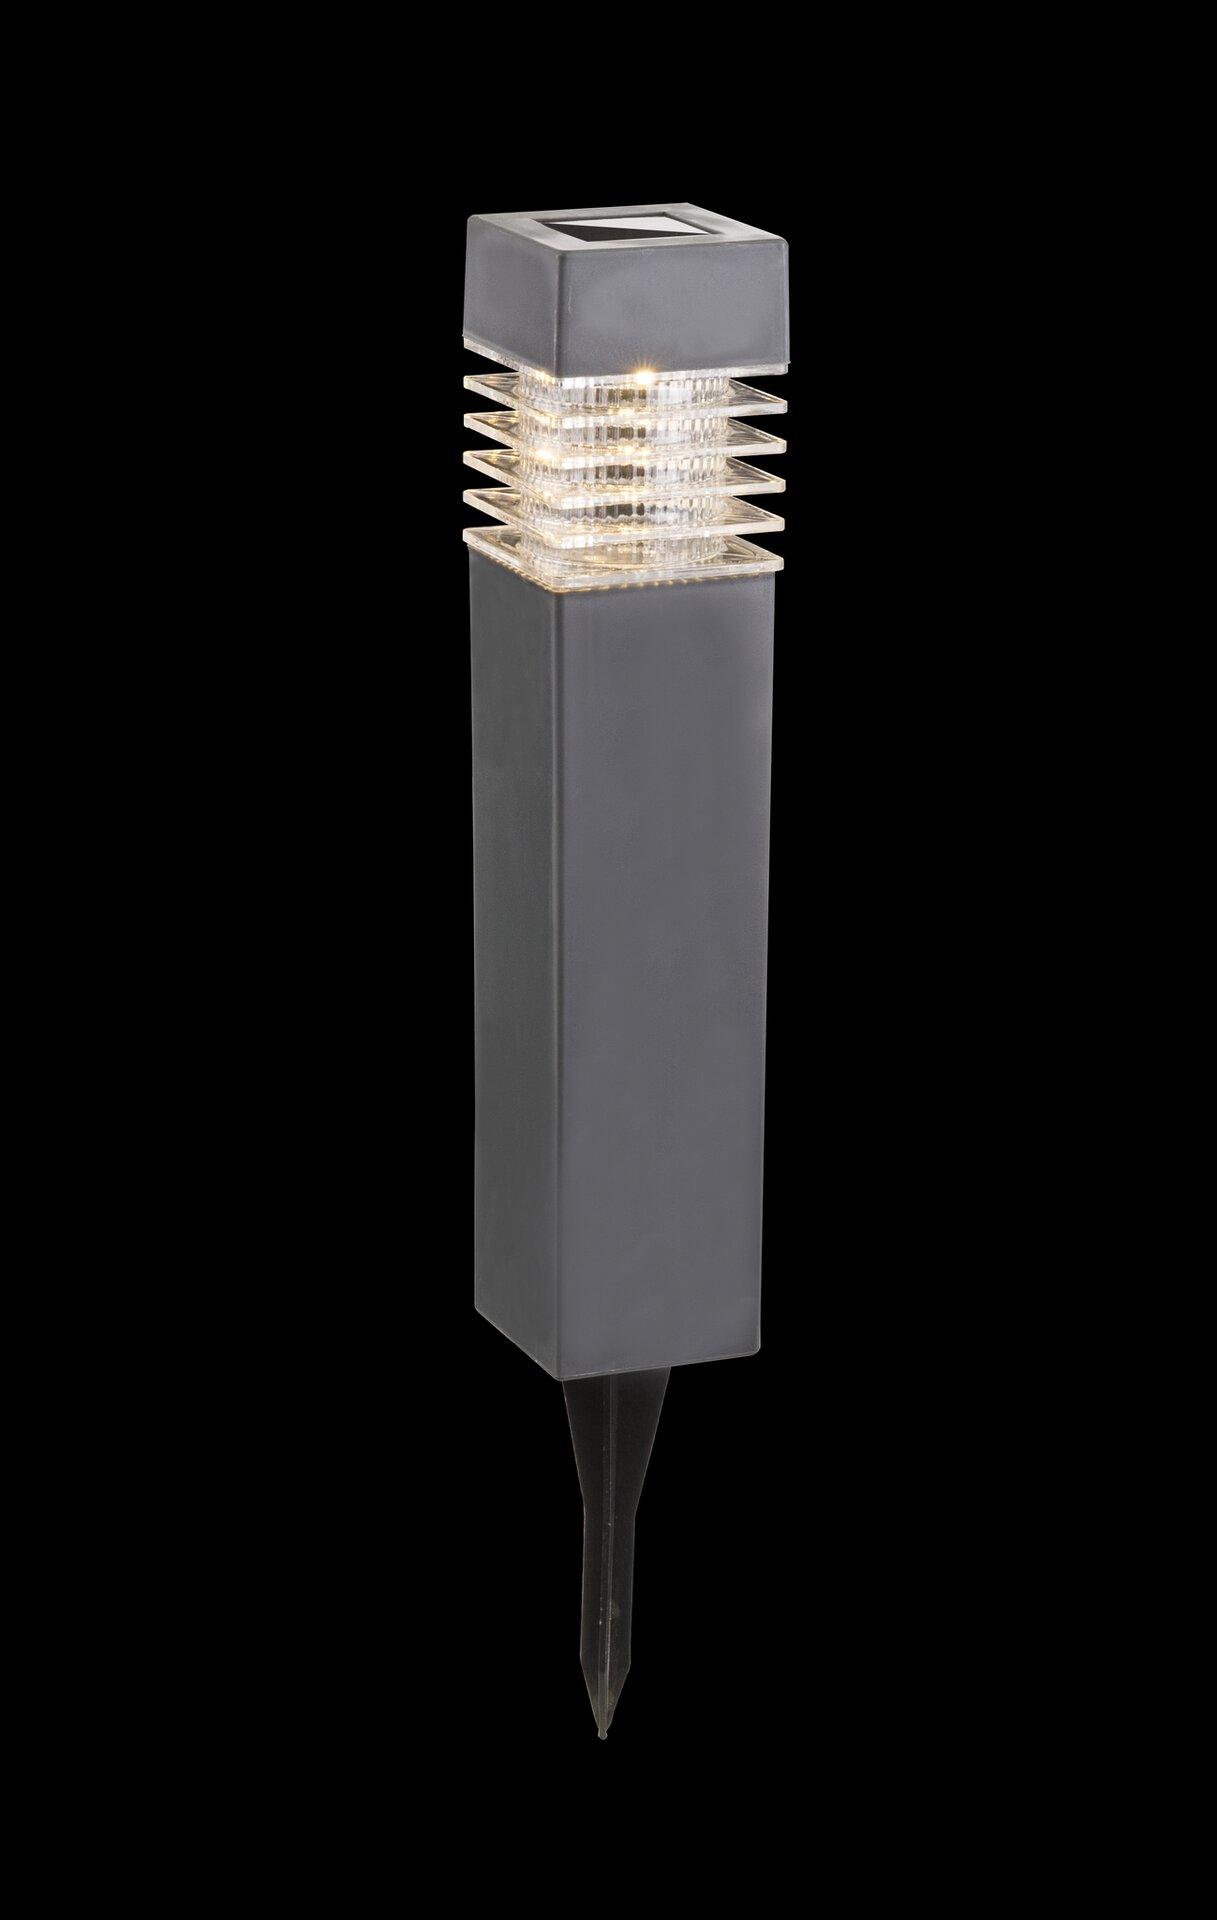 Solarleuchte Solar Globo Kunststoff grau 6 x 39 x 6 cm